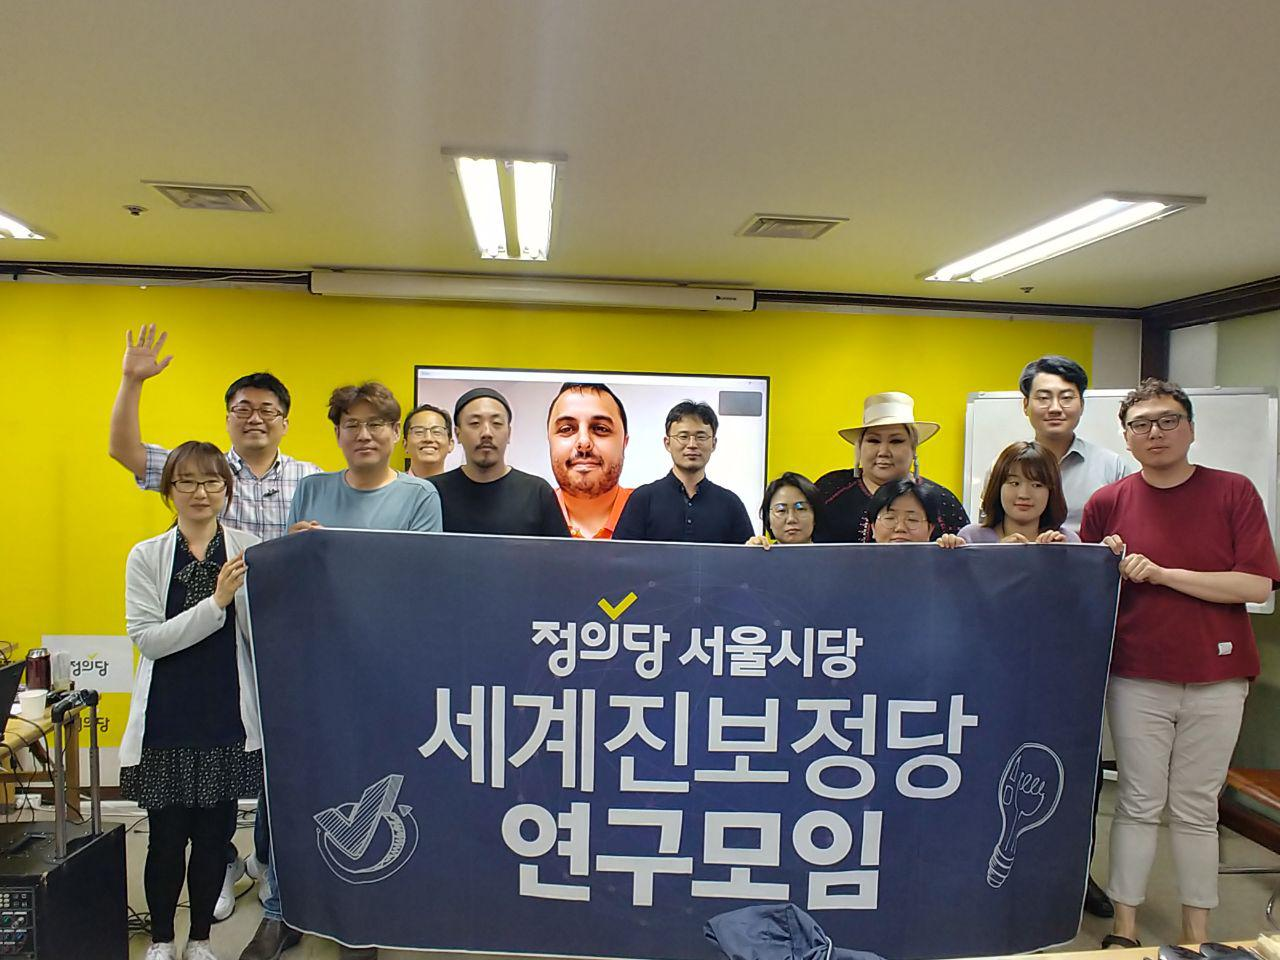 Group photo of David Perejil and participants